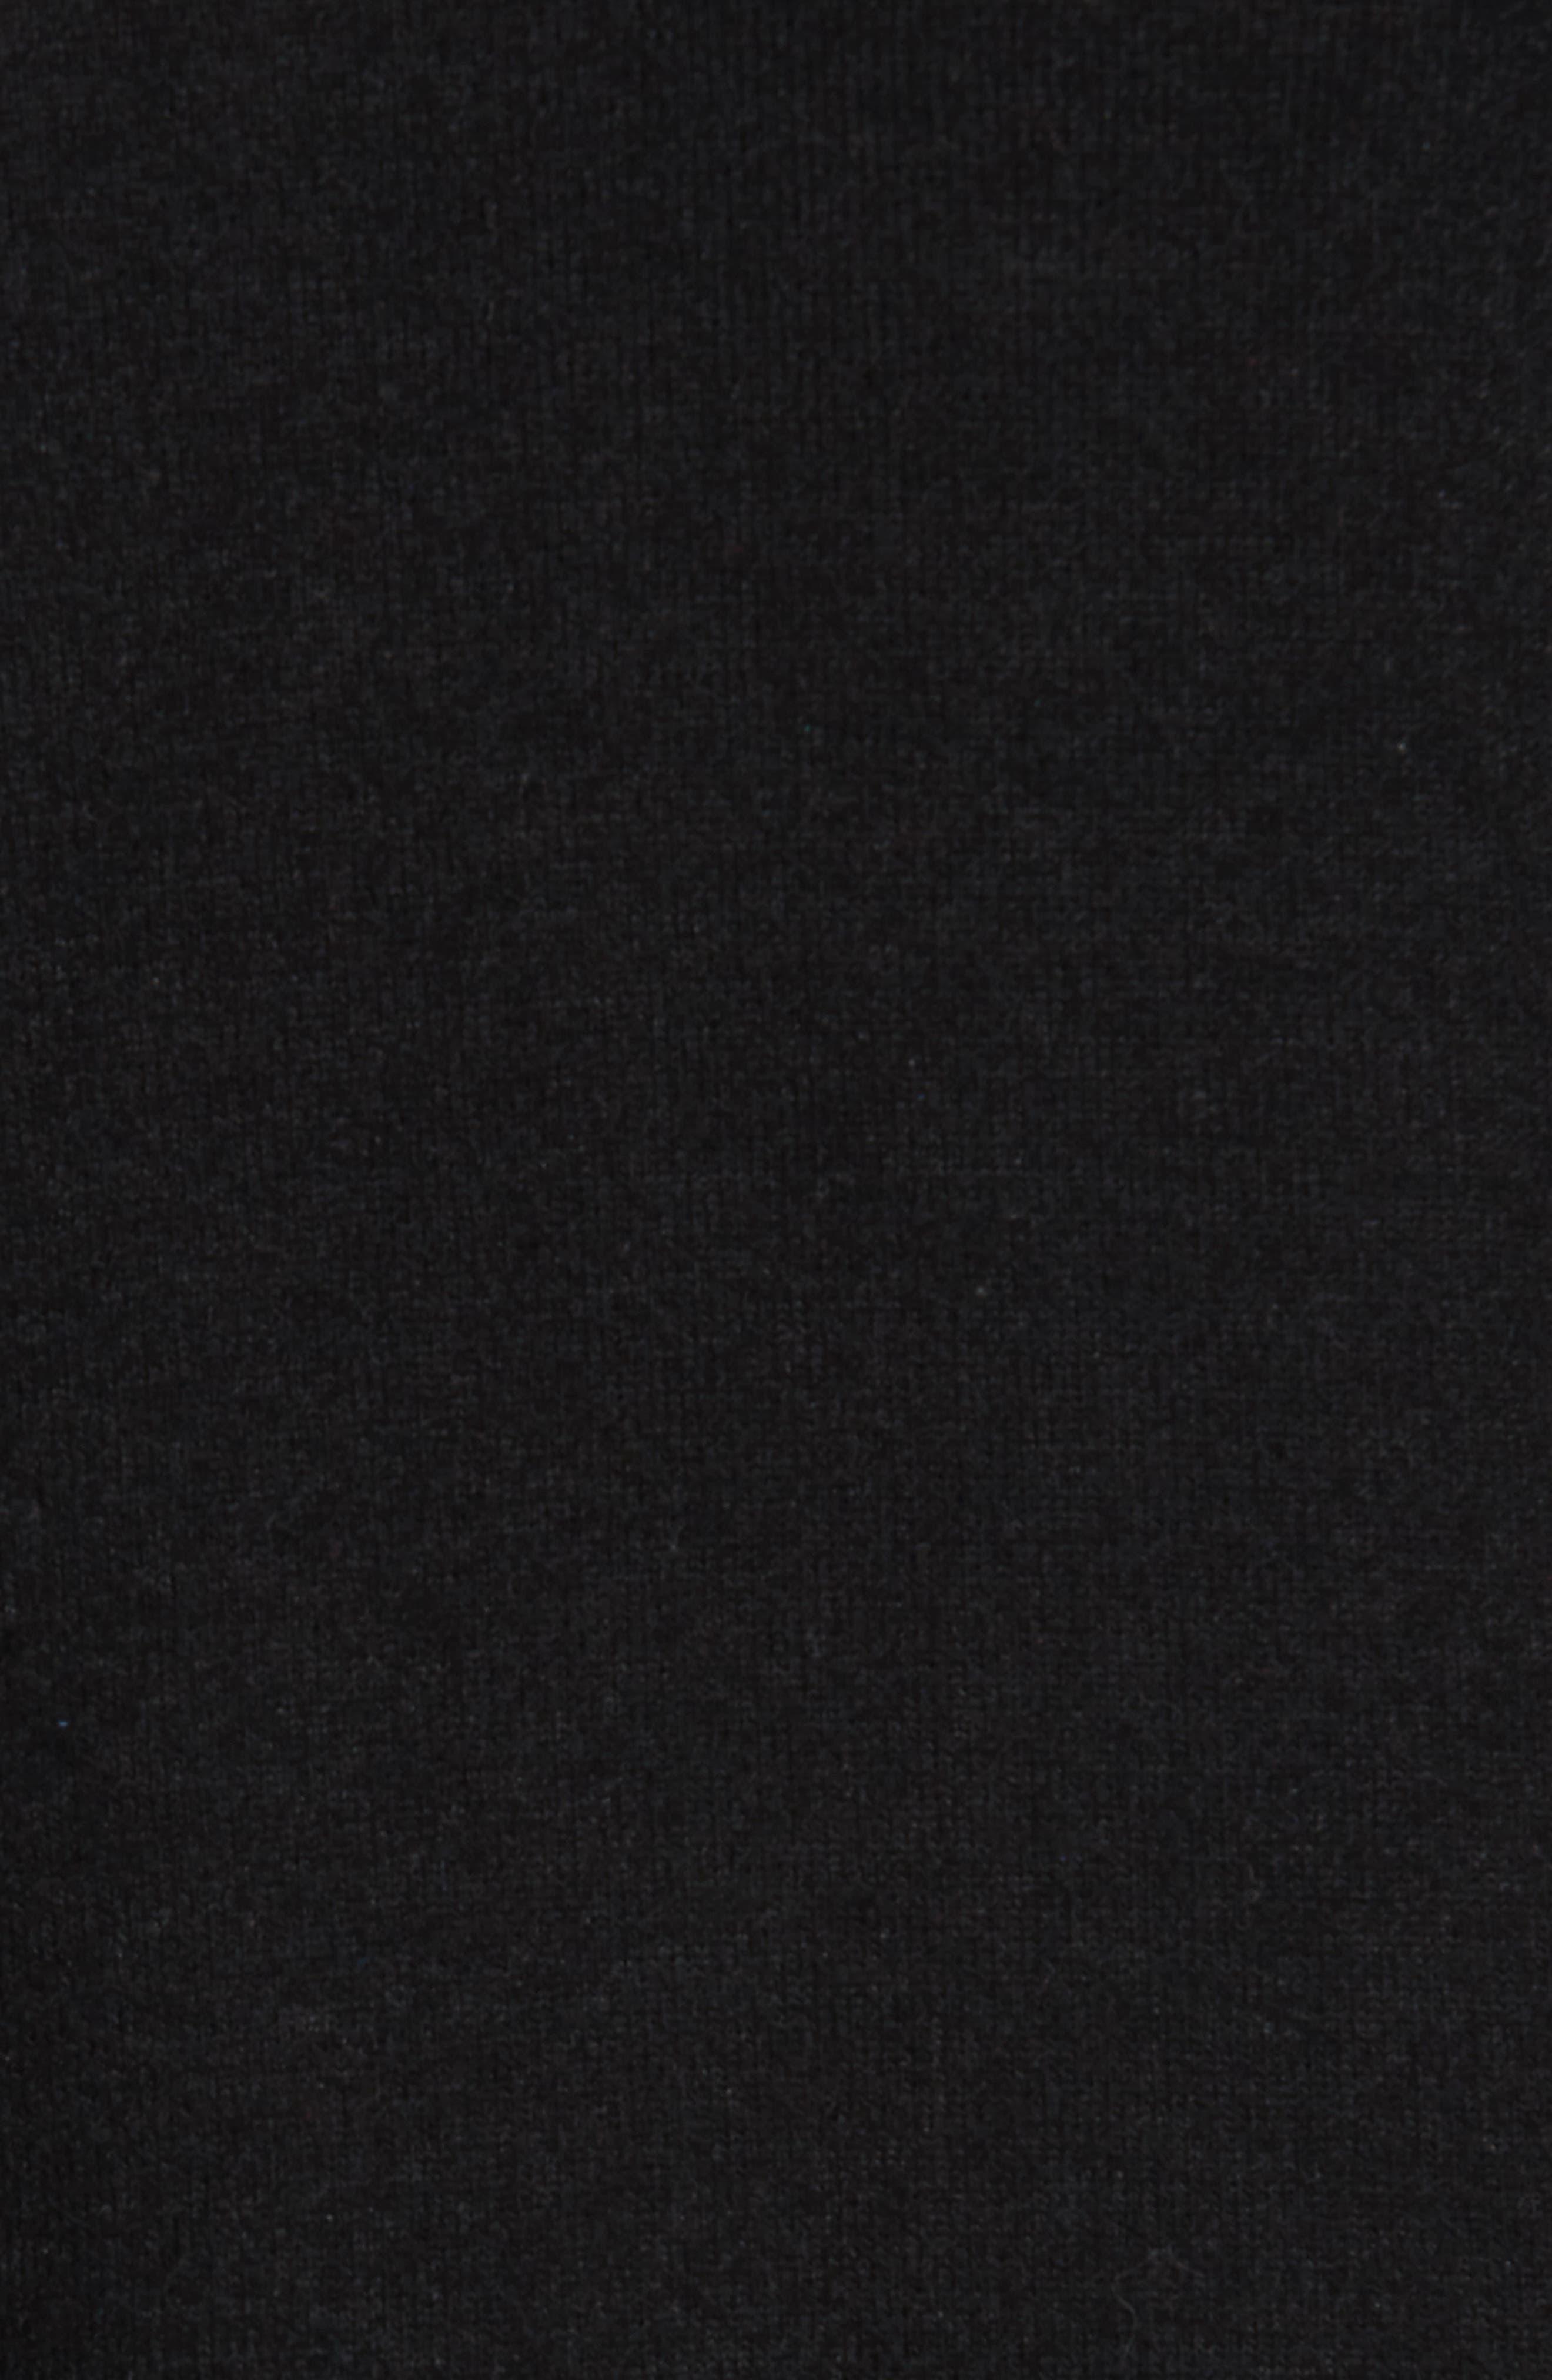 Side-Tie Fleece Pullover,                             Alternate thumbnail 5, color,                             001